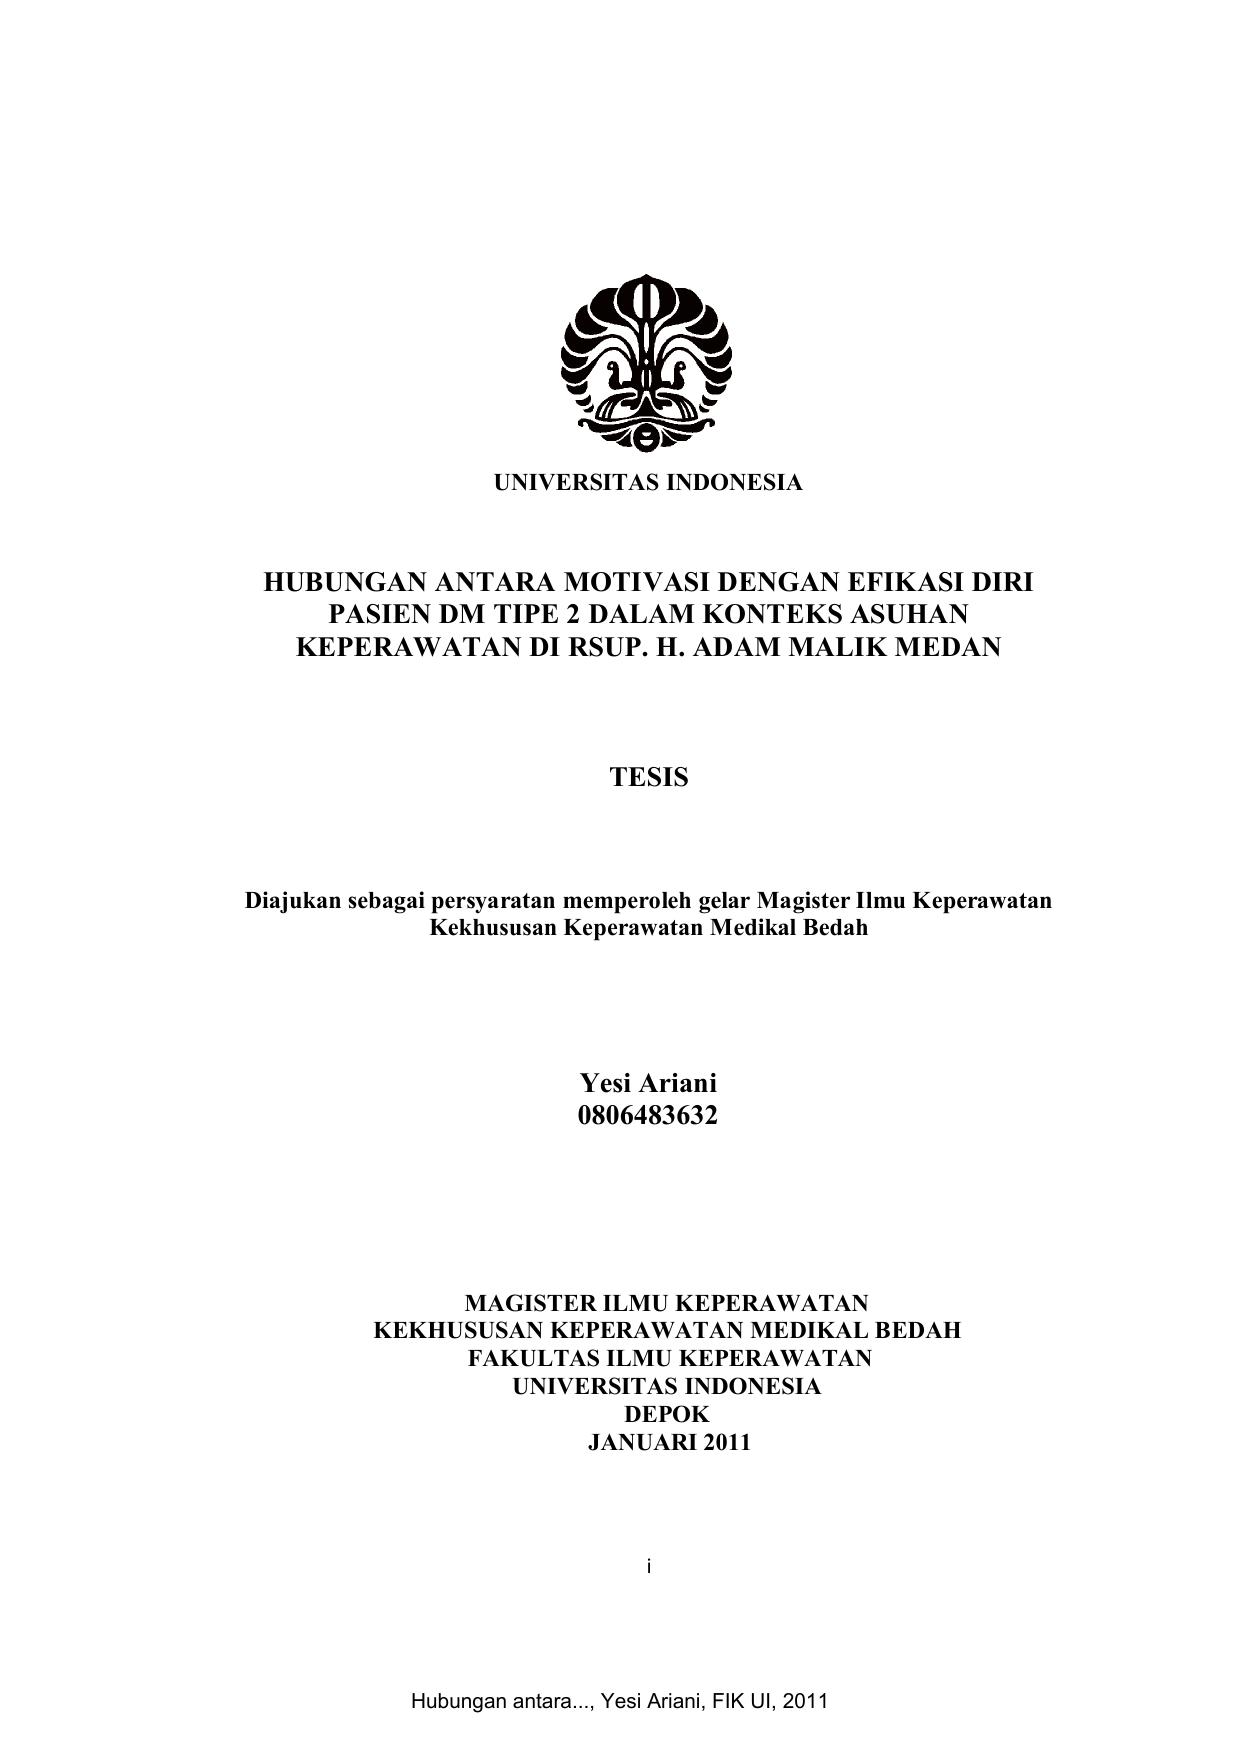 Contoh Proposal Penelitian Keperawatan Medikal Bedah Berbagi Contoh Proposal